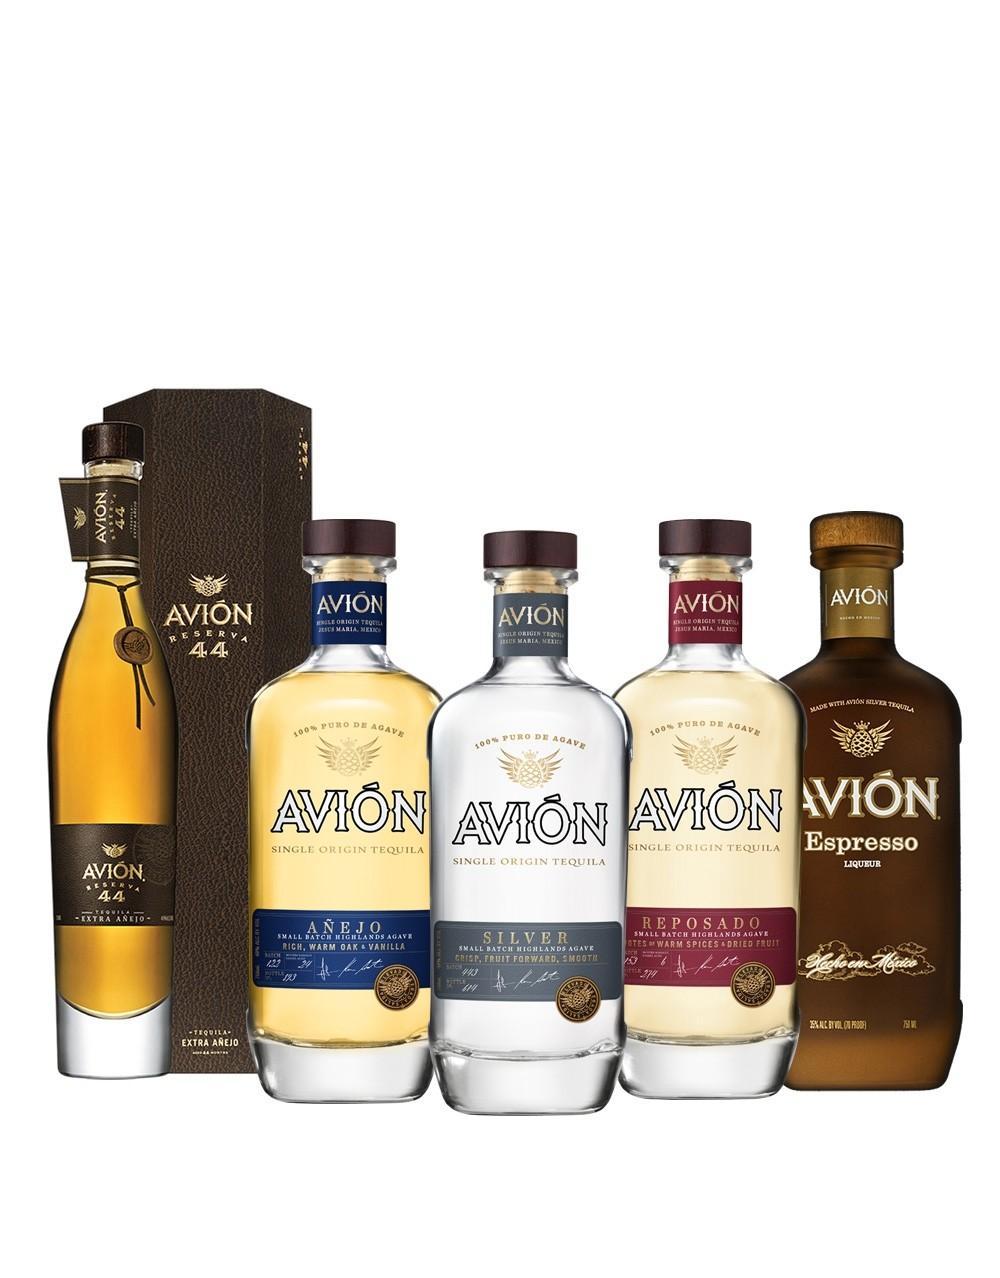 b24c07a5e13f67 Avión Tequila Collection (5 bottles)